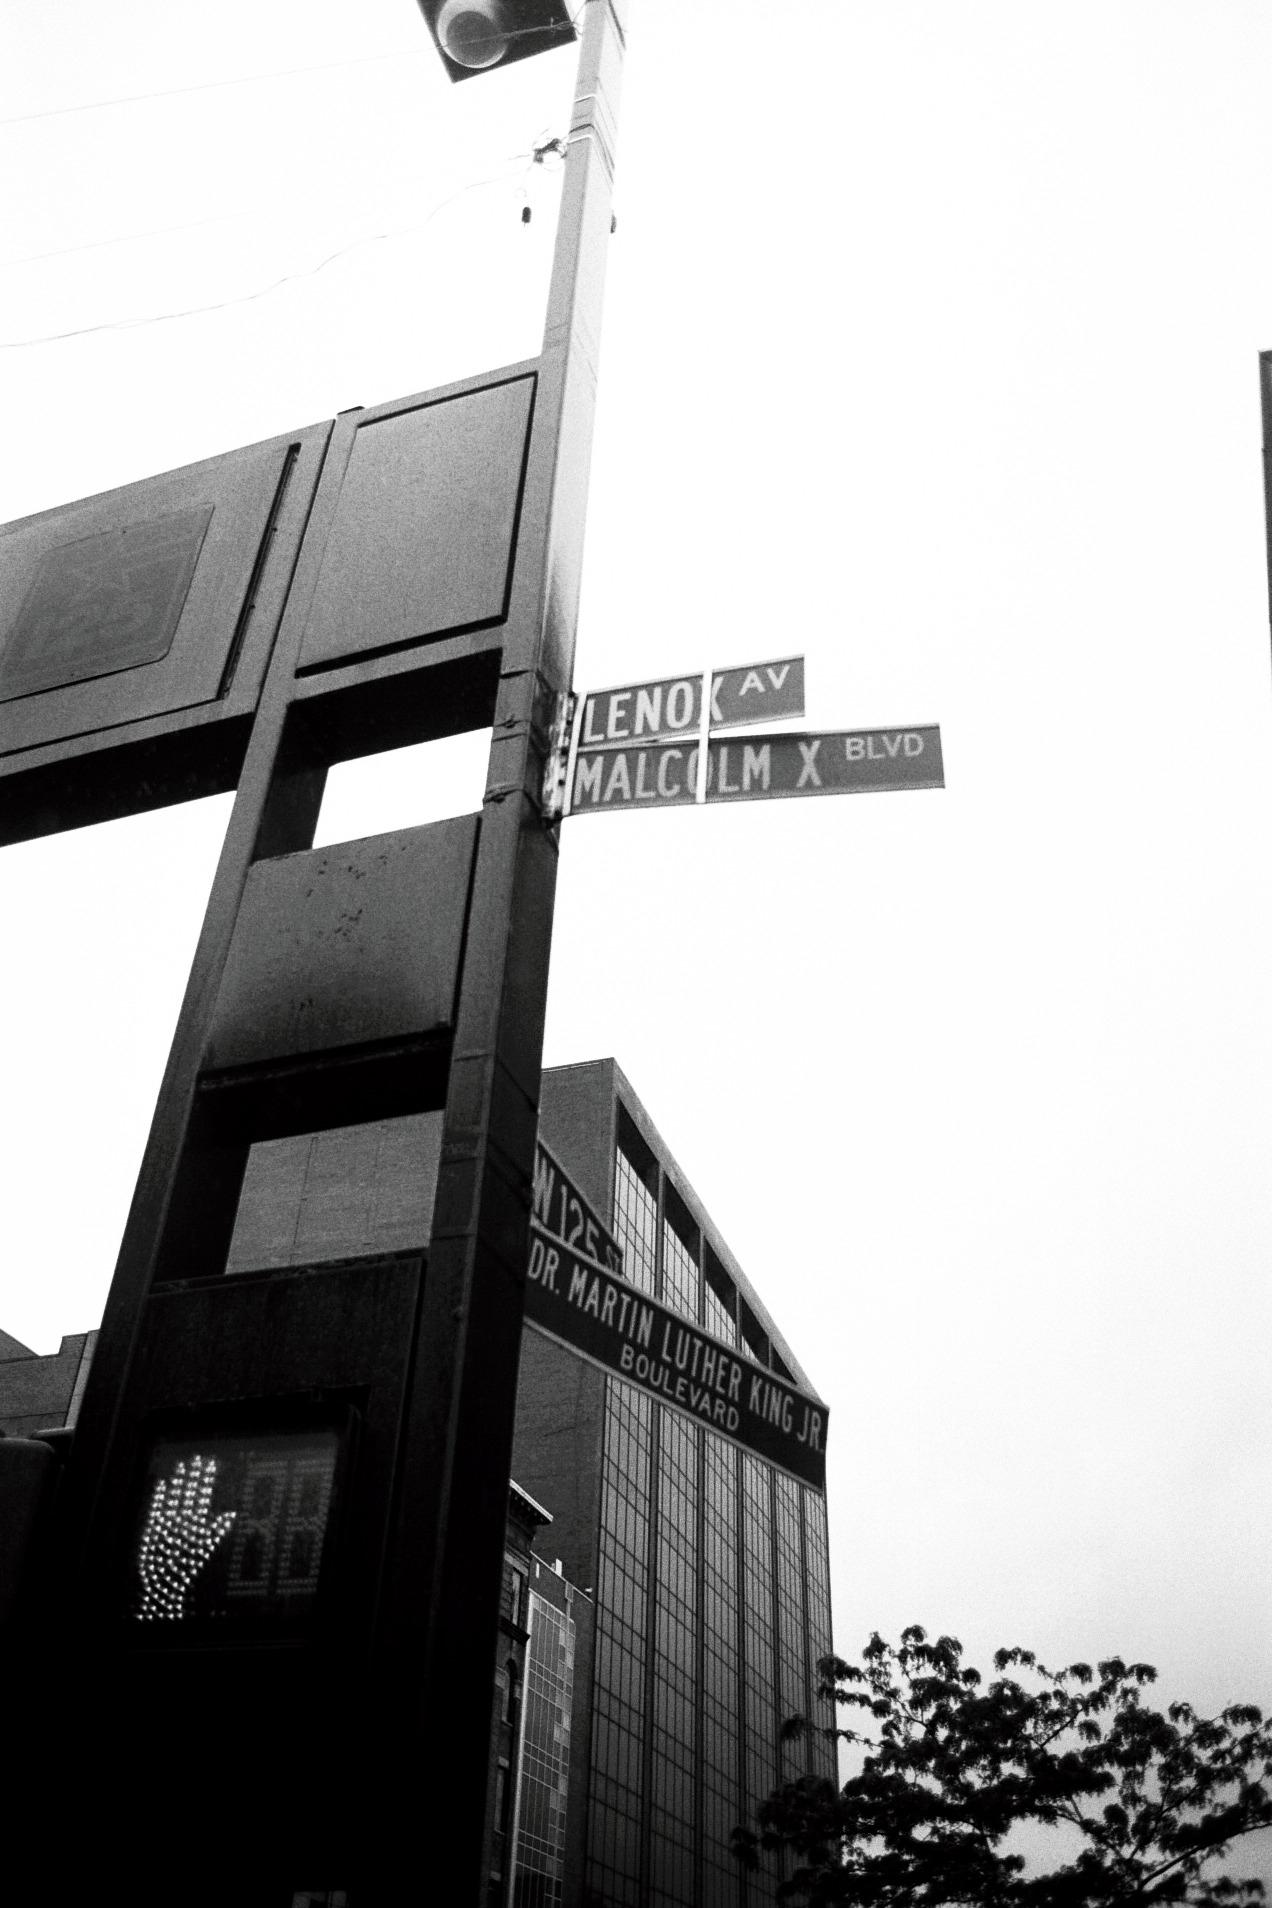 03_CANON_EOS_1N_BW_Harlem_NYC_copyright_thomasApp.jpg